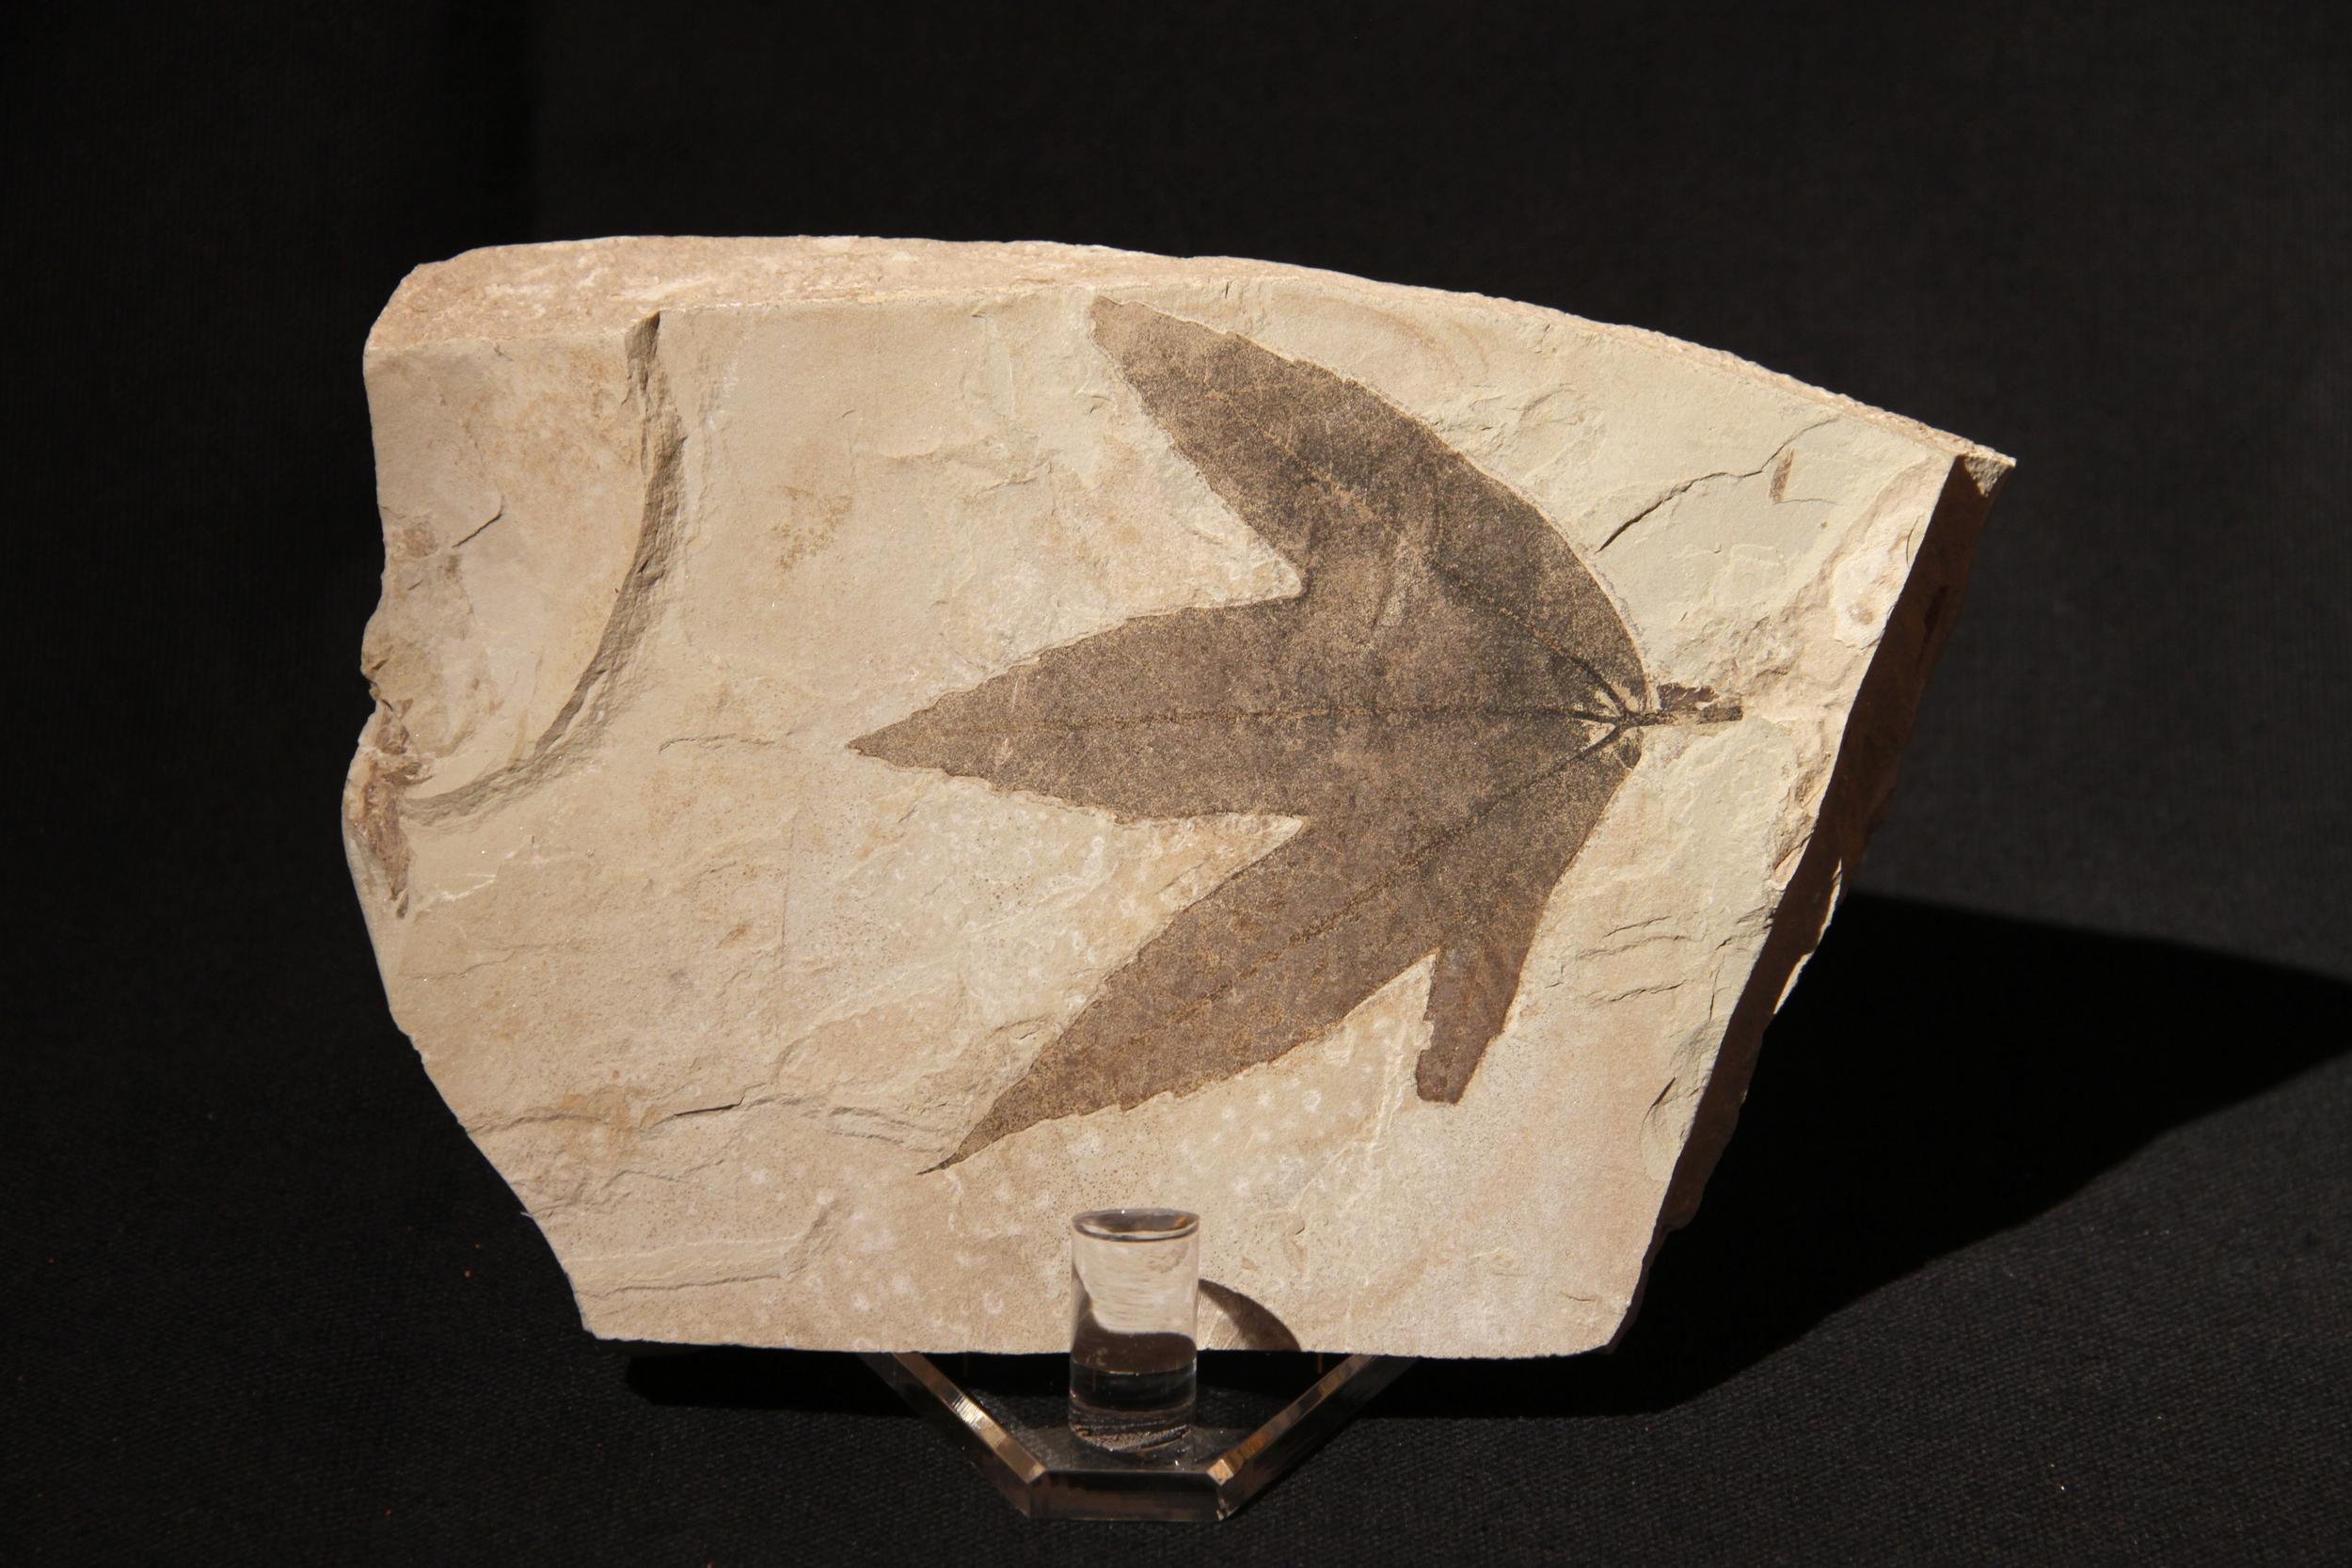 Green River fossil leaf